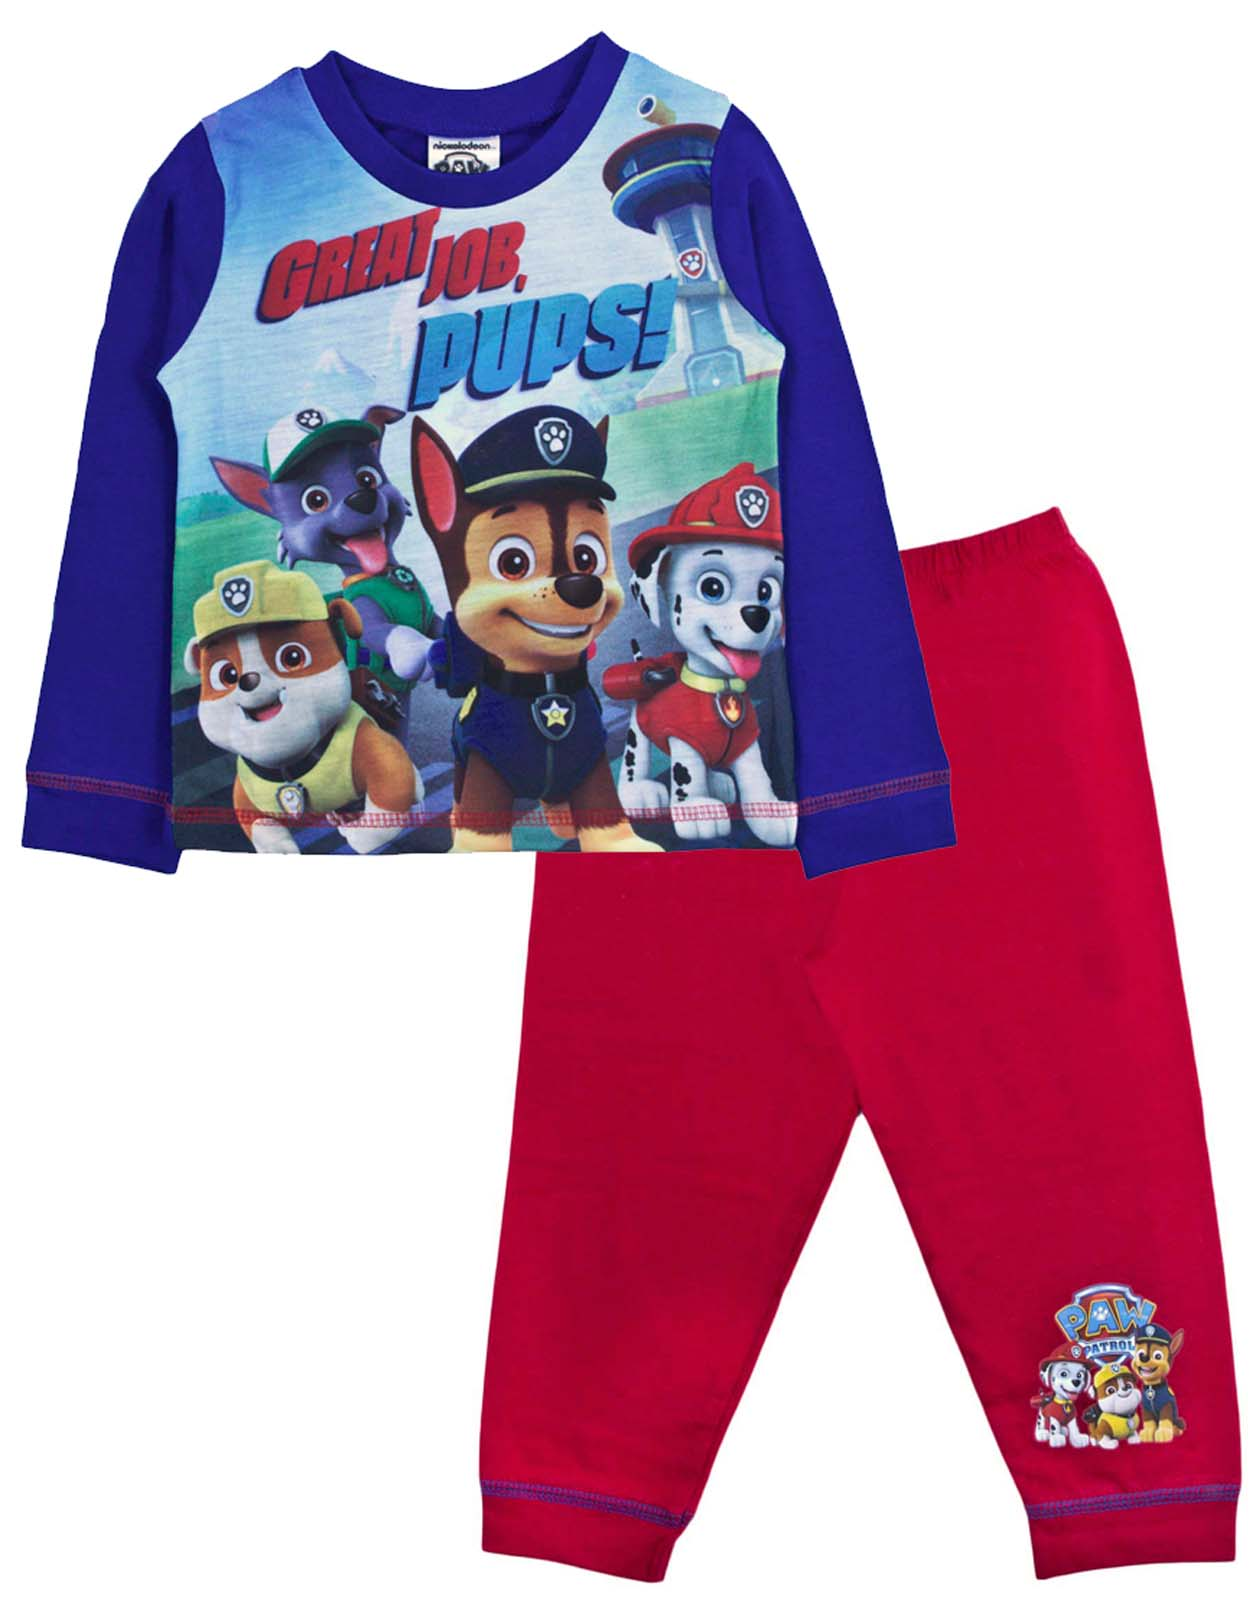 Paw Patrol Nightwear Set 18-24 months Boy/'s Pyjamas /& Dressing Gown  Nickelodeon